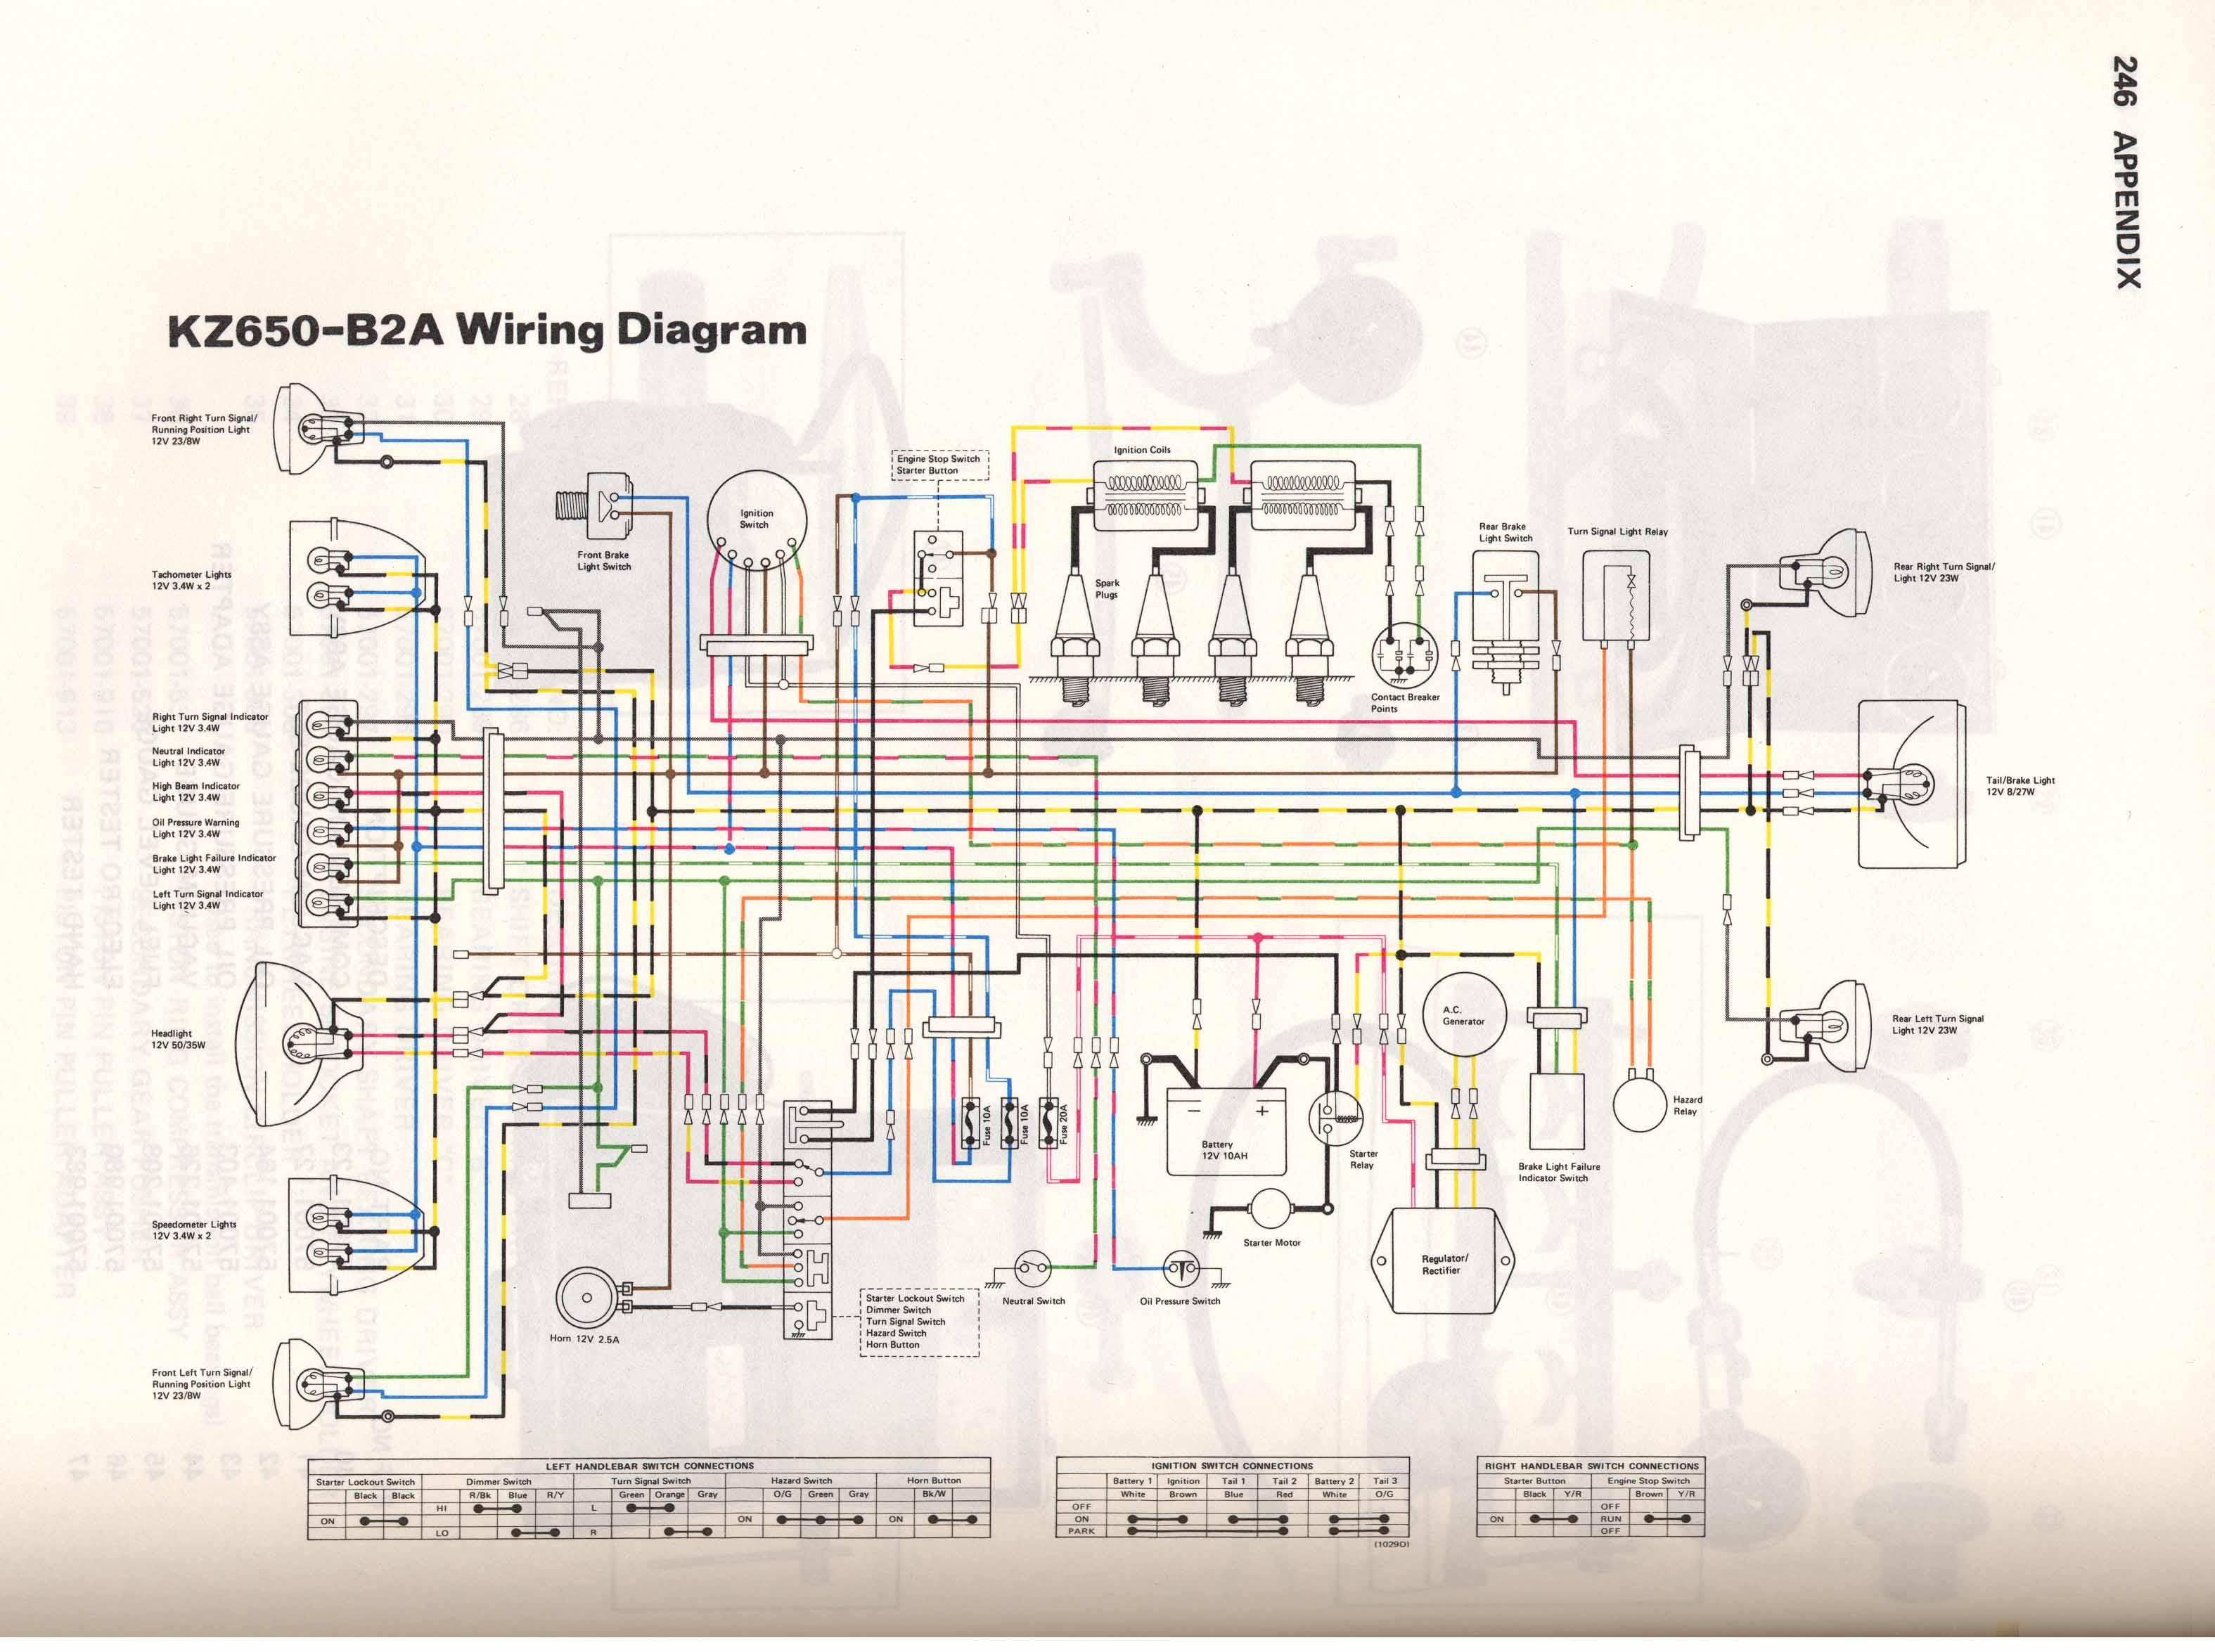 Kz650 B1 Wiring Harness | Wiring Diagram on